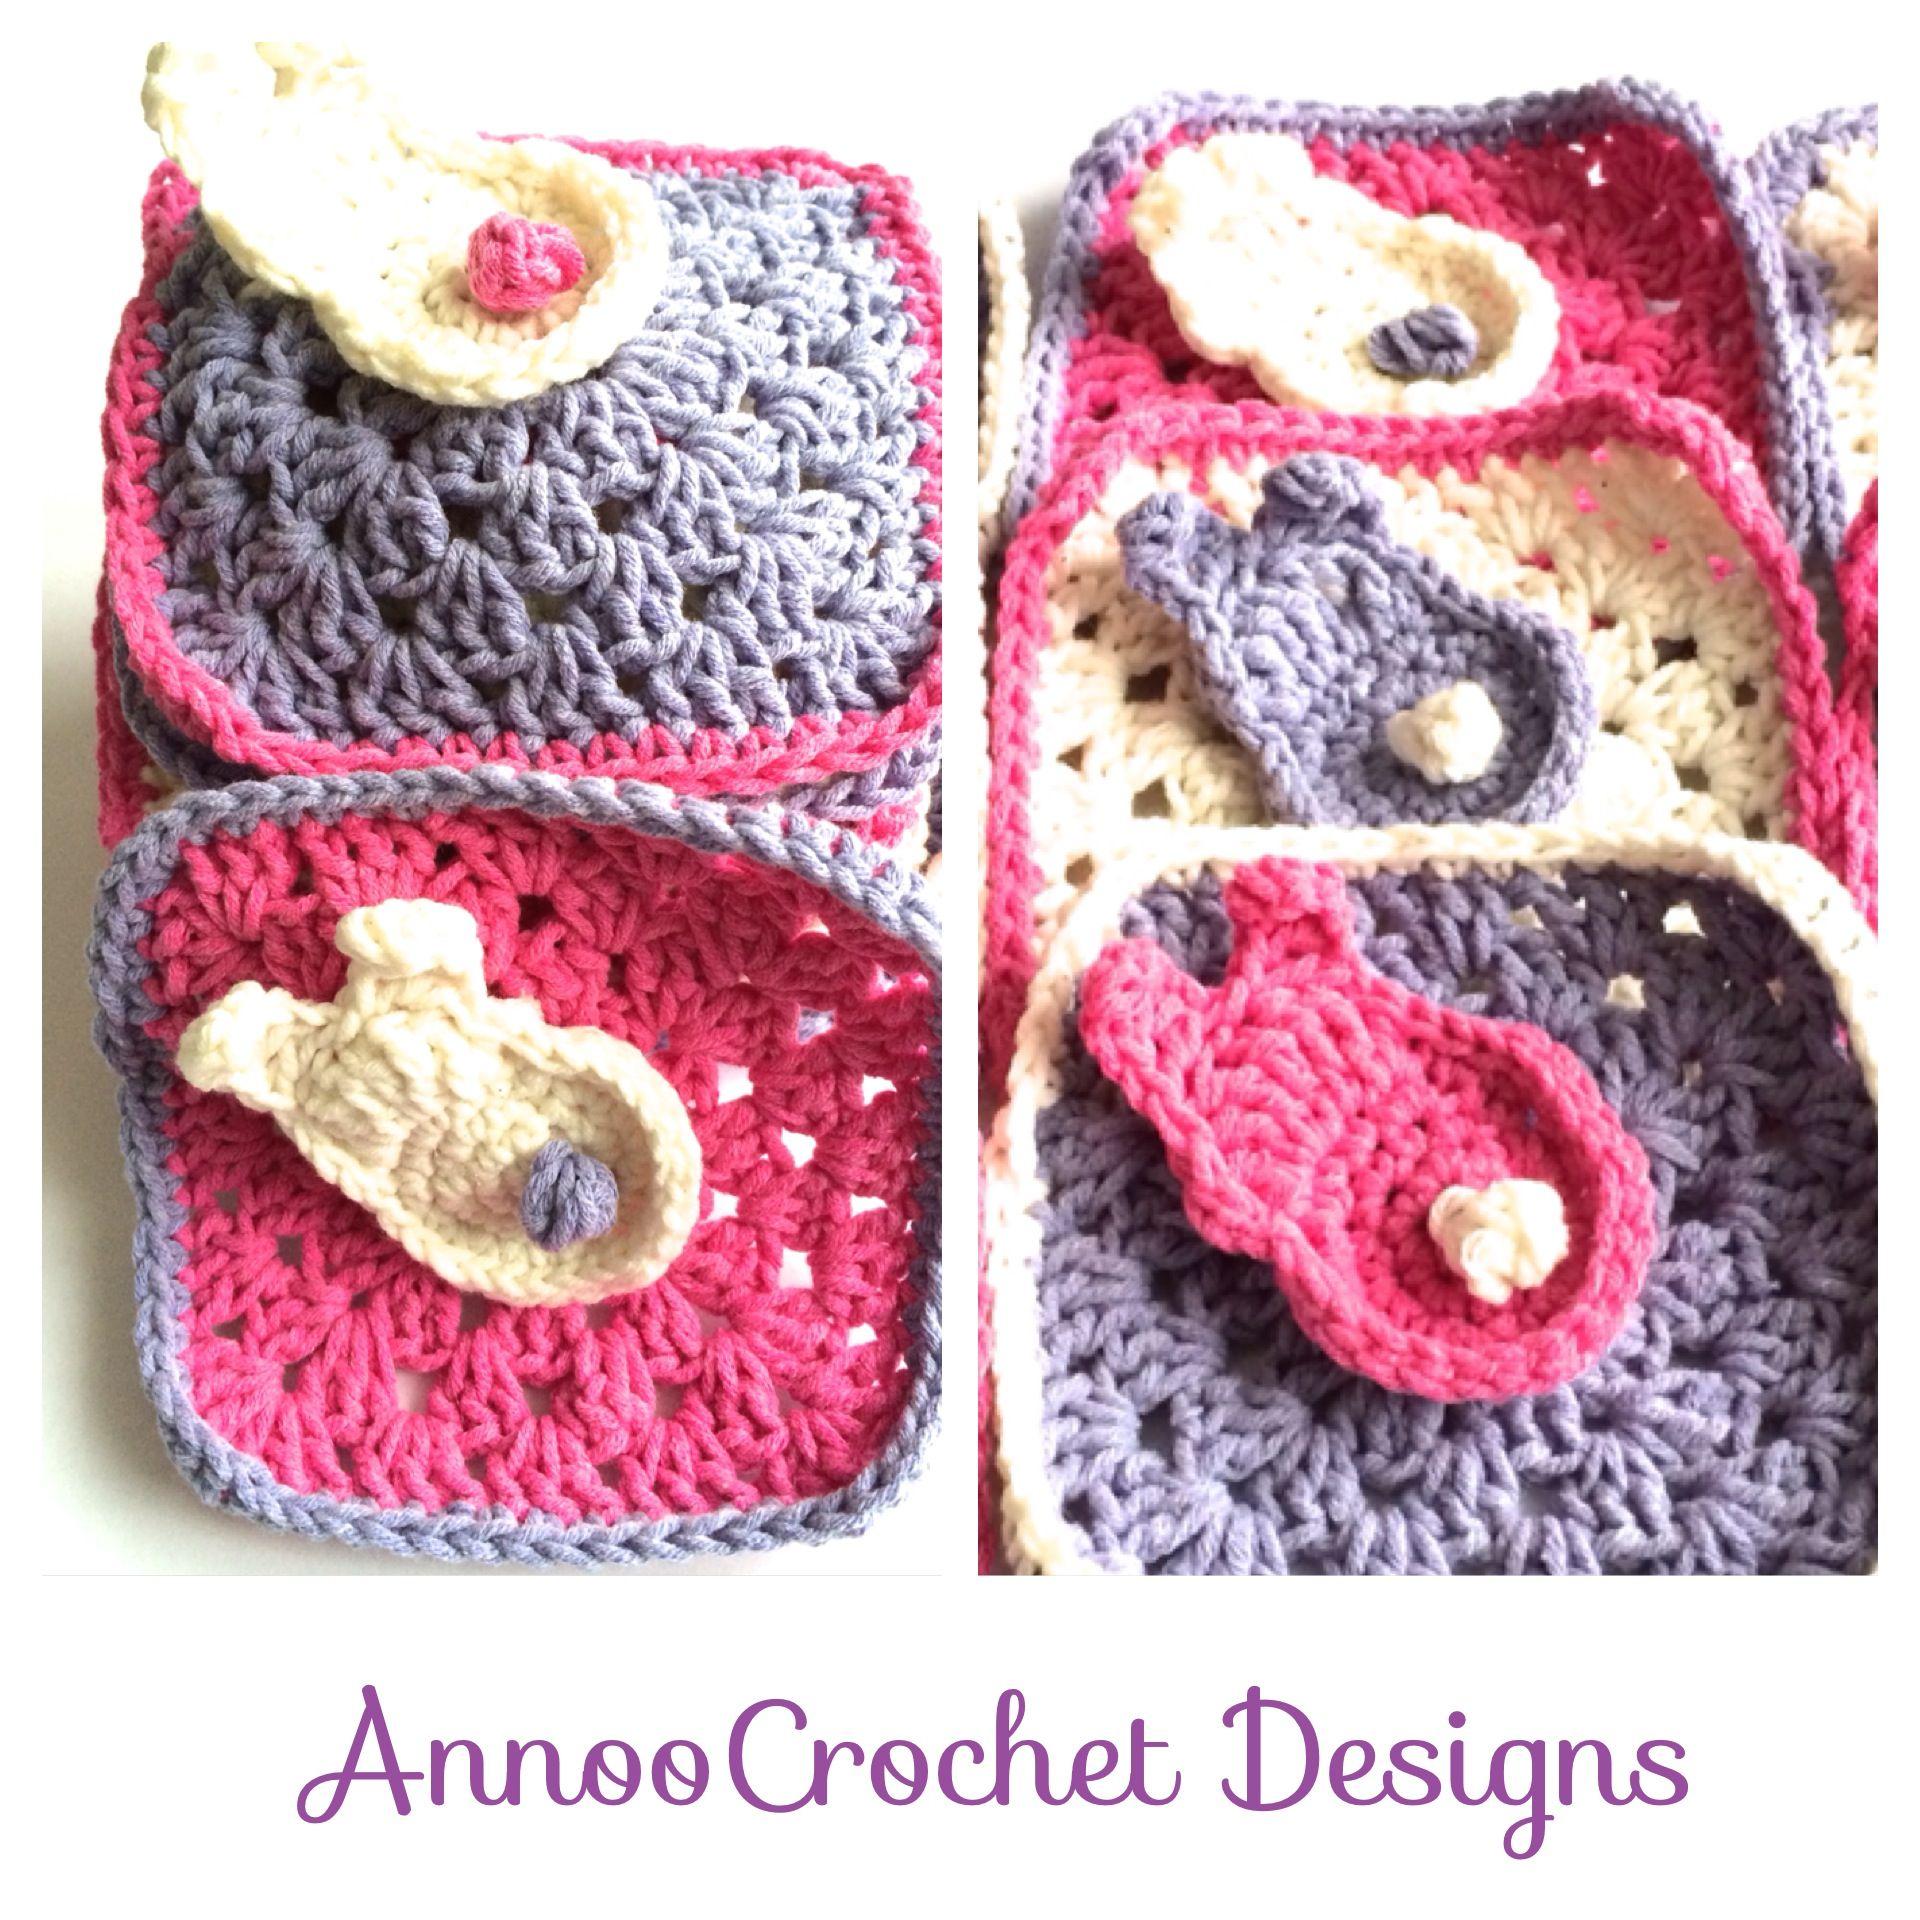 Spring Bunny Granny Free Tutorila By AnnooCrochet Designs | Comida a ...